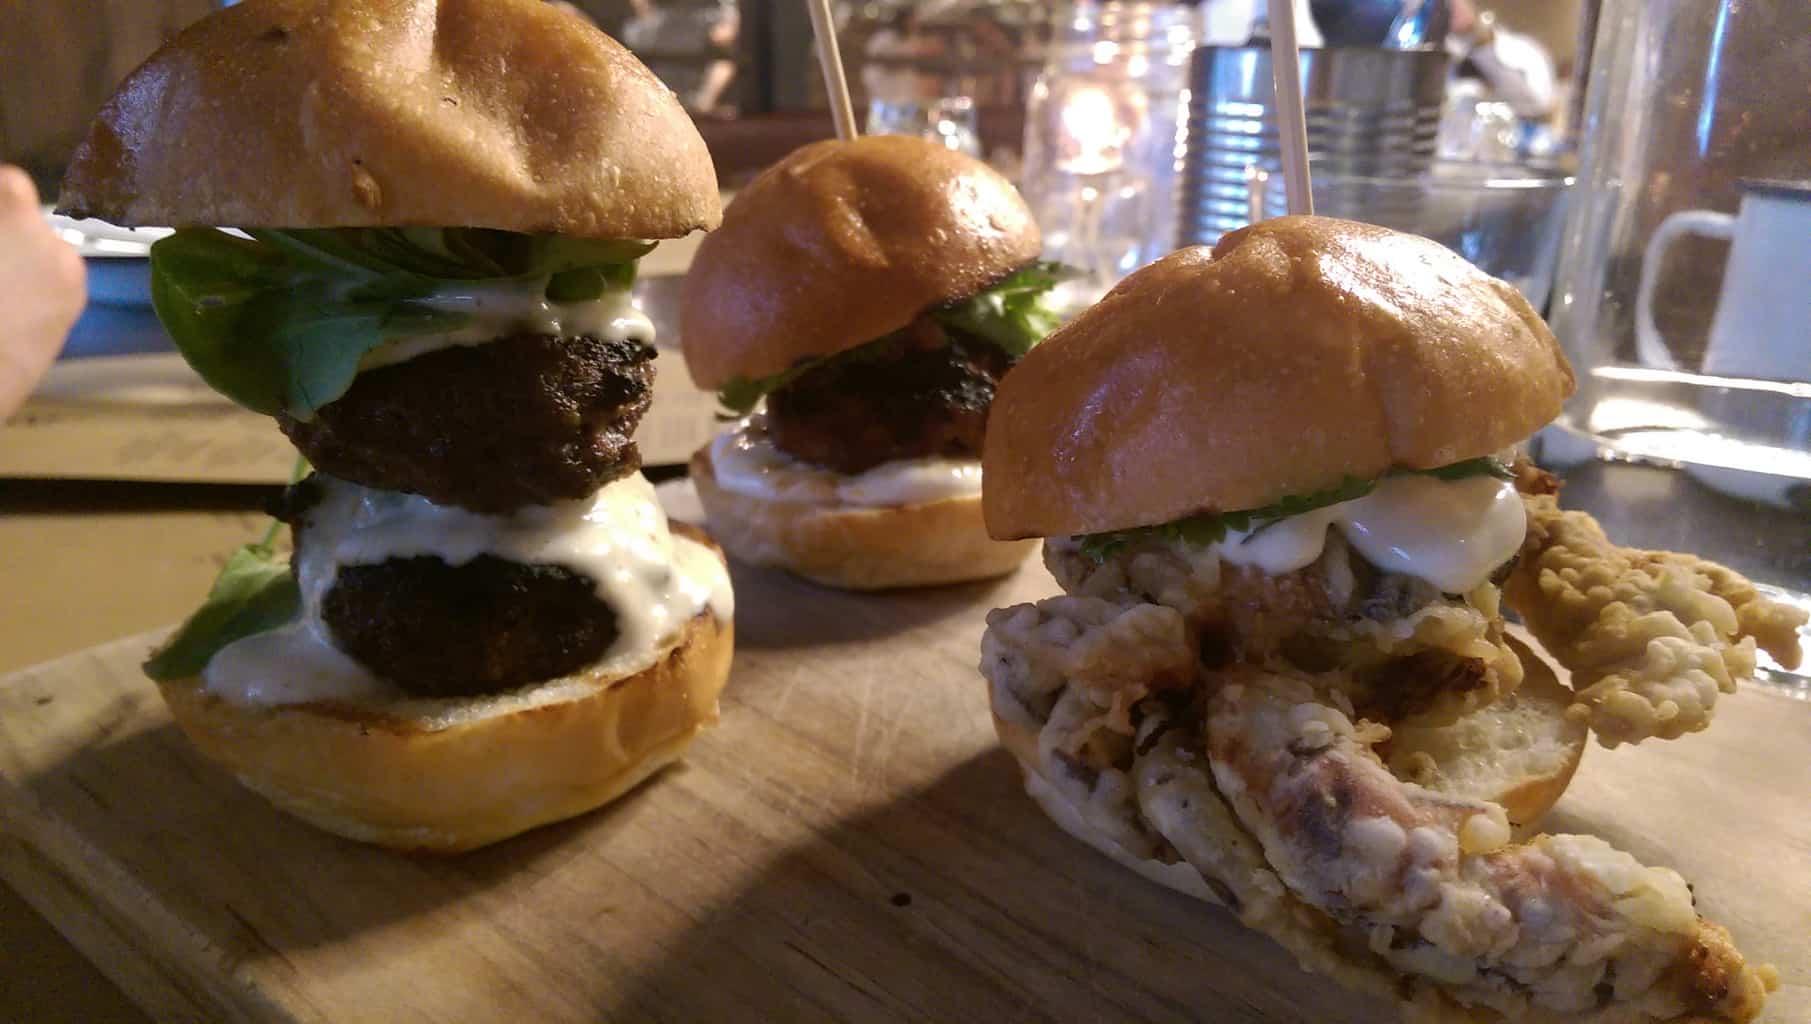 trio sliders (spiced lamb, beef, soft shell crab)